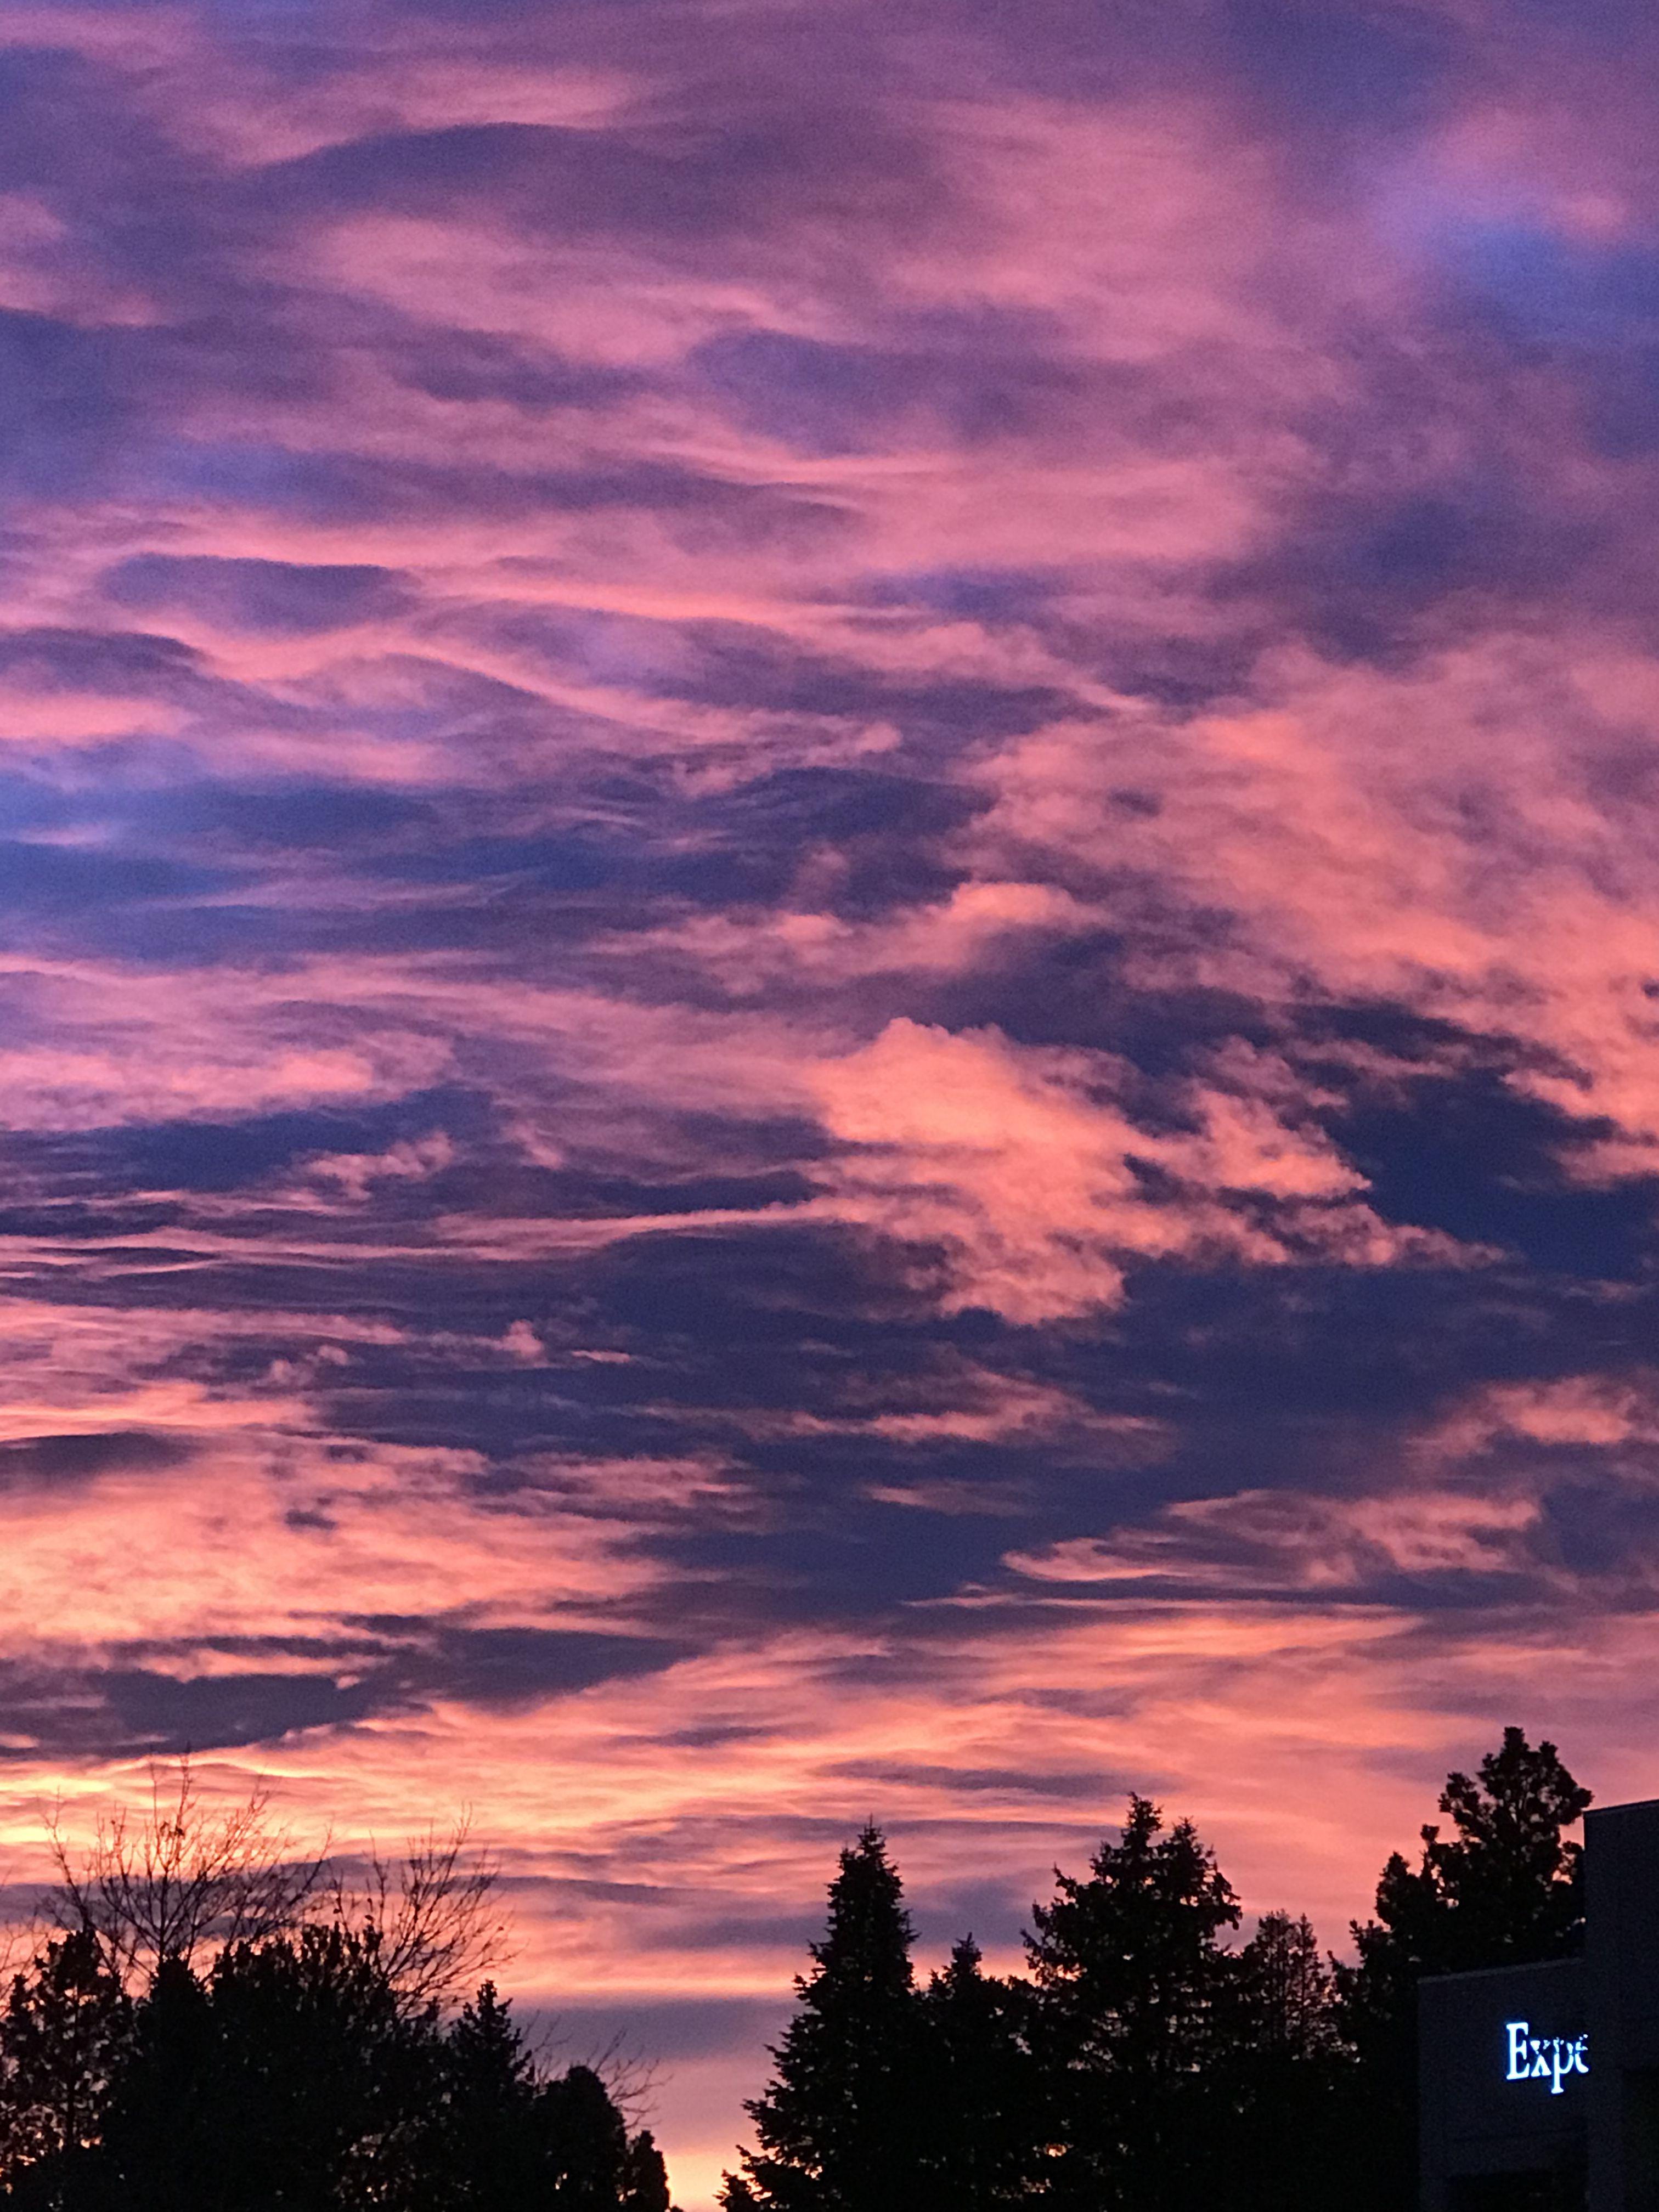 Absolutely Beautiful Amazing Nature Photos Sky Aesthetic Beautiful Nature Pink sky sunset sun trees nature